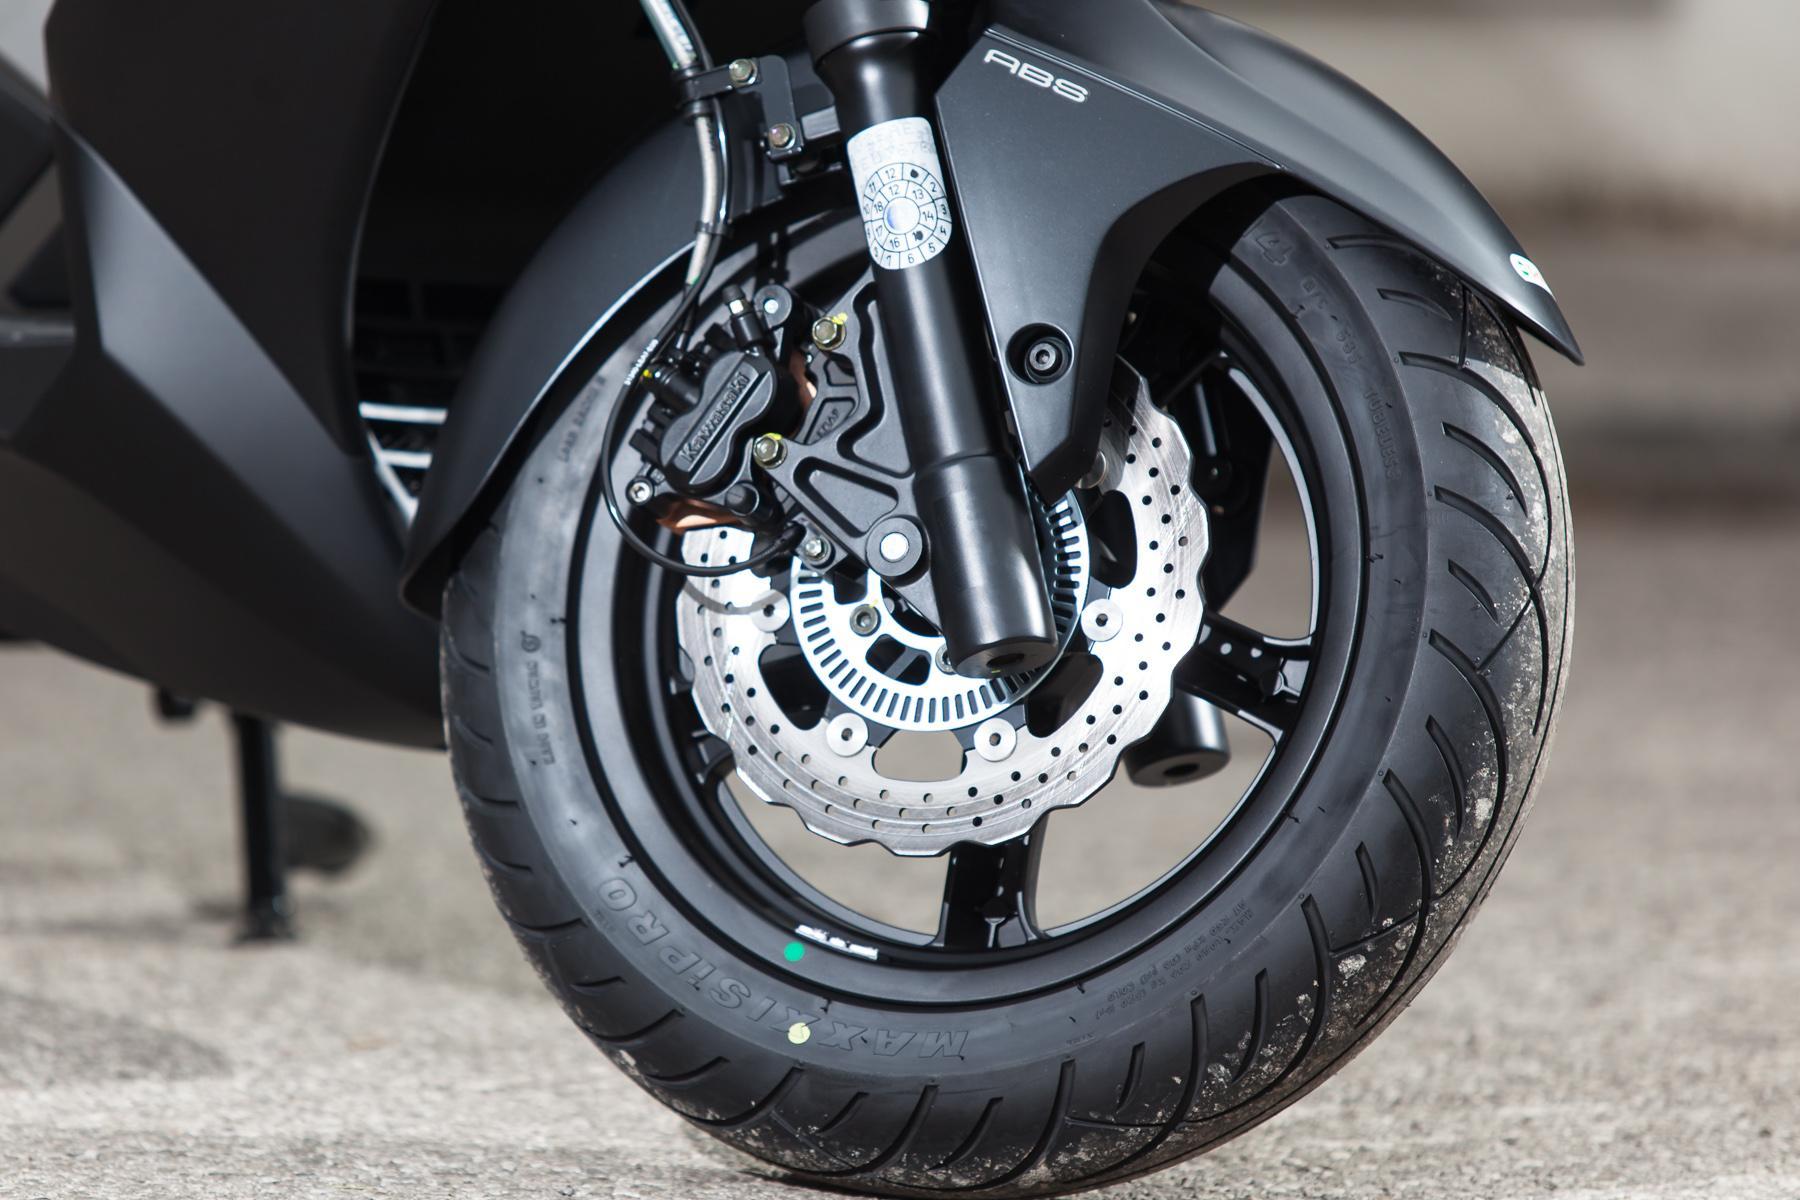 http://www.motorrad-bilder.at/slideshows/291/010647/kawasaki_j300_roller-10.jpg